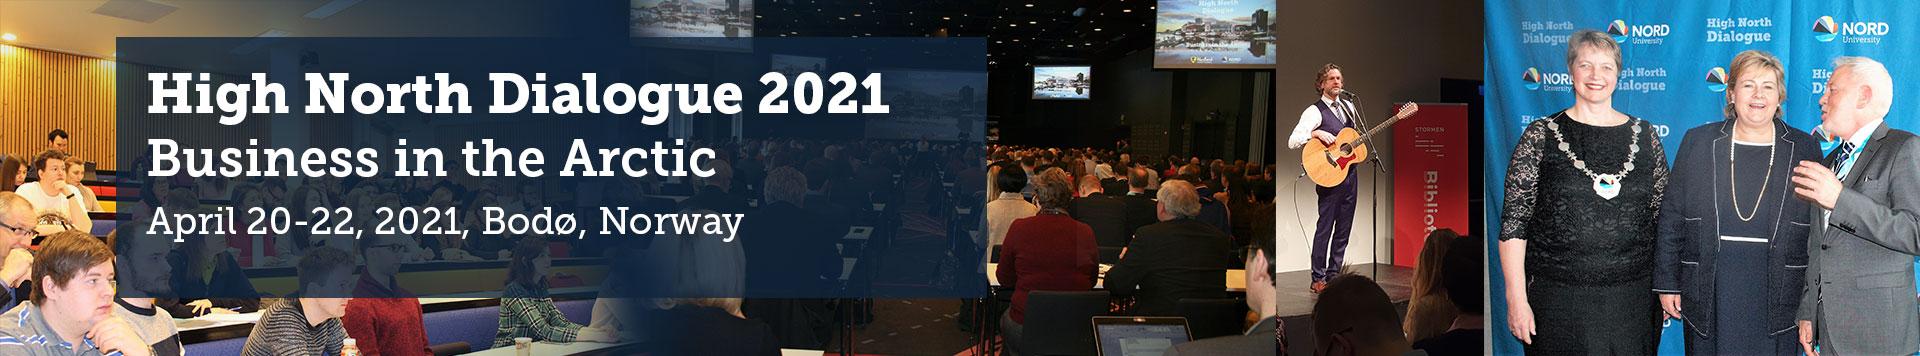 High North Dialogue 2021